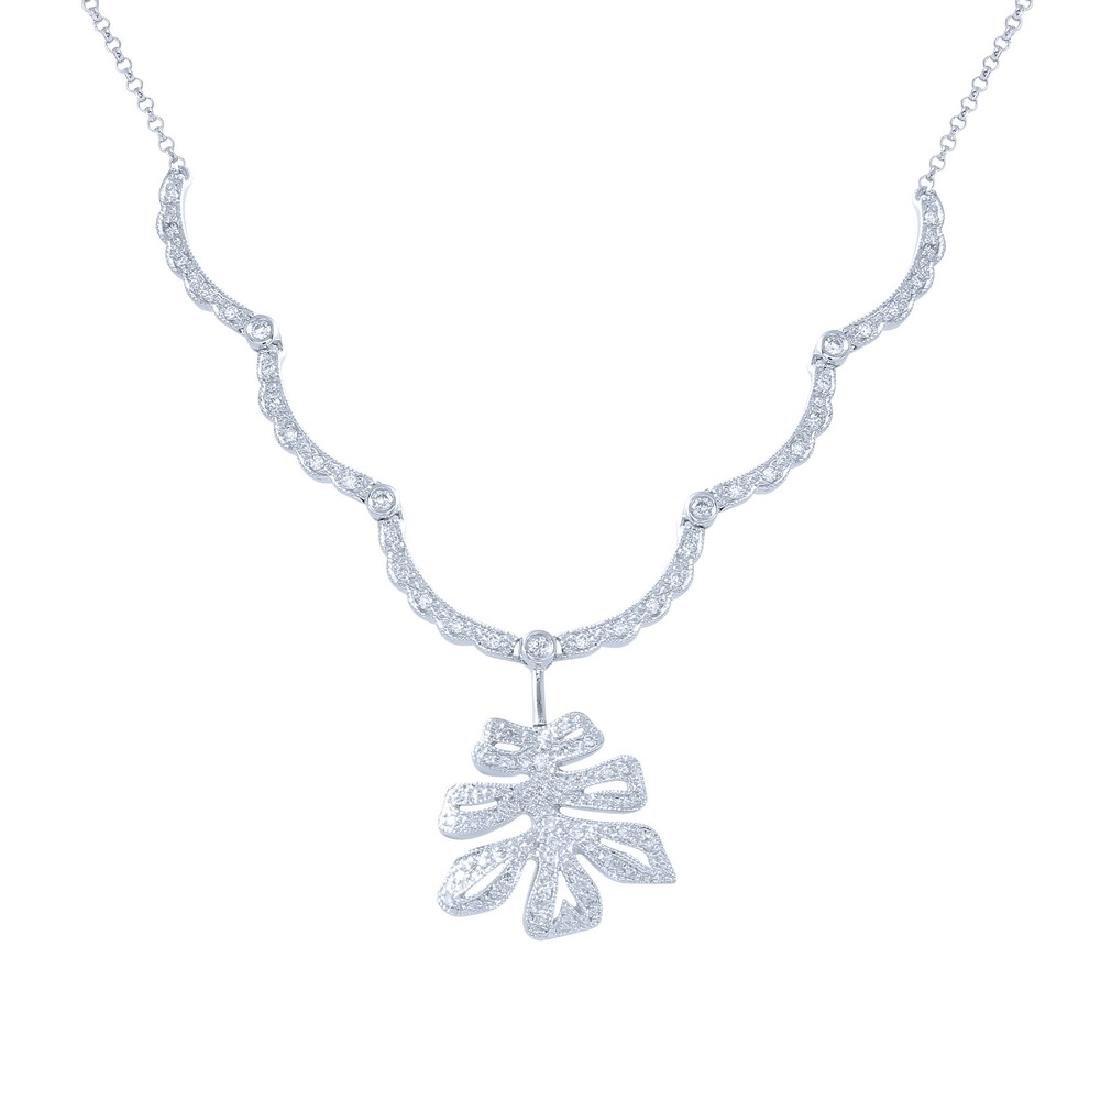 Genuine 0.59 TCW 18K White Gold Ladies Necklace